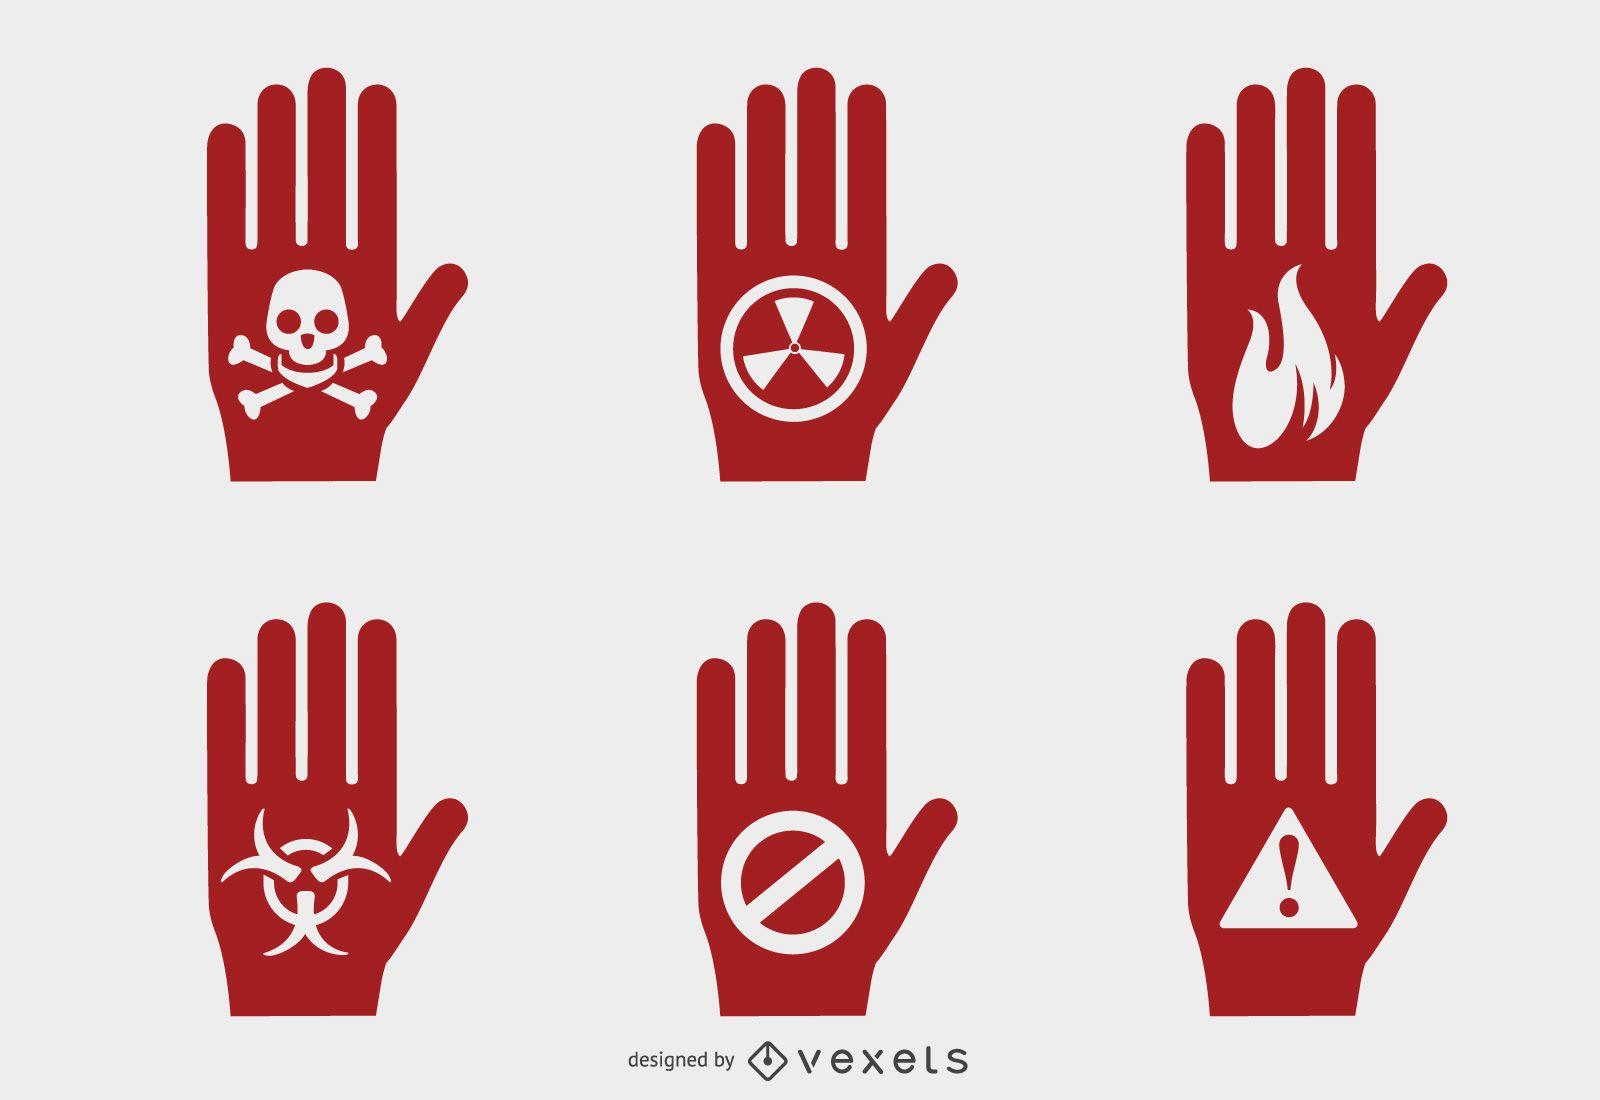 Hand hazard symbols